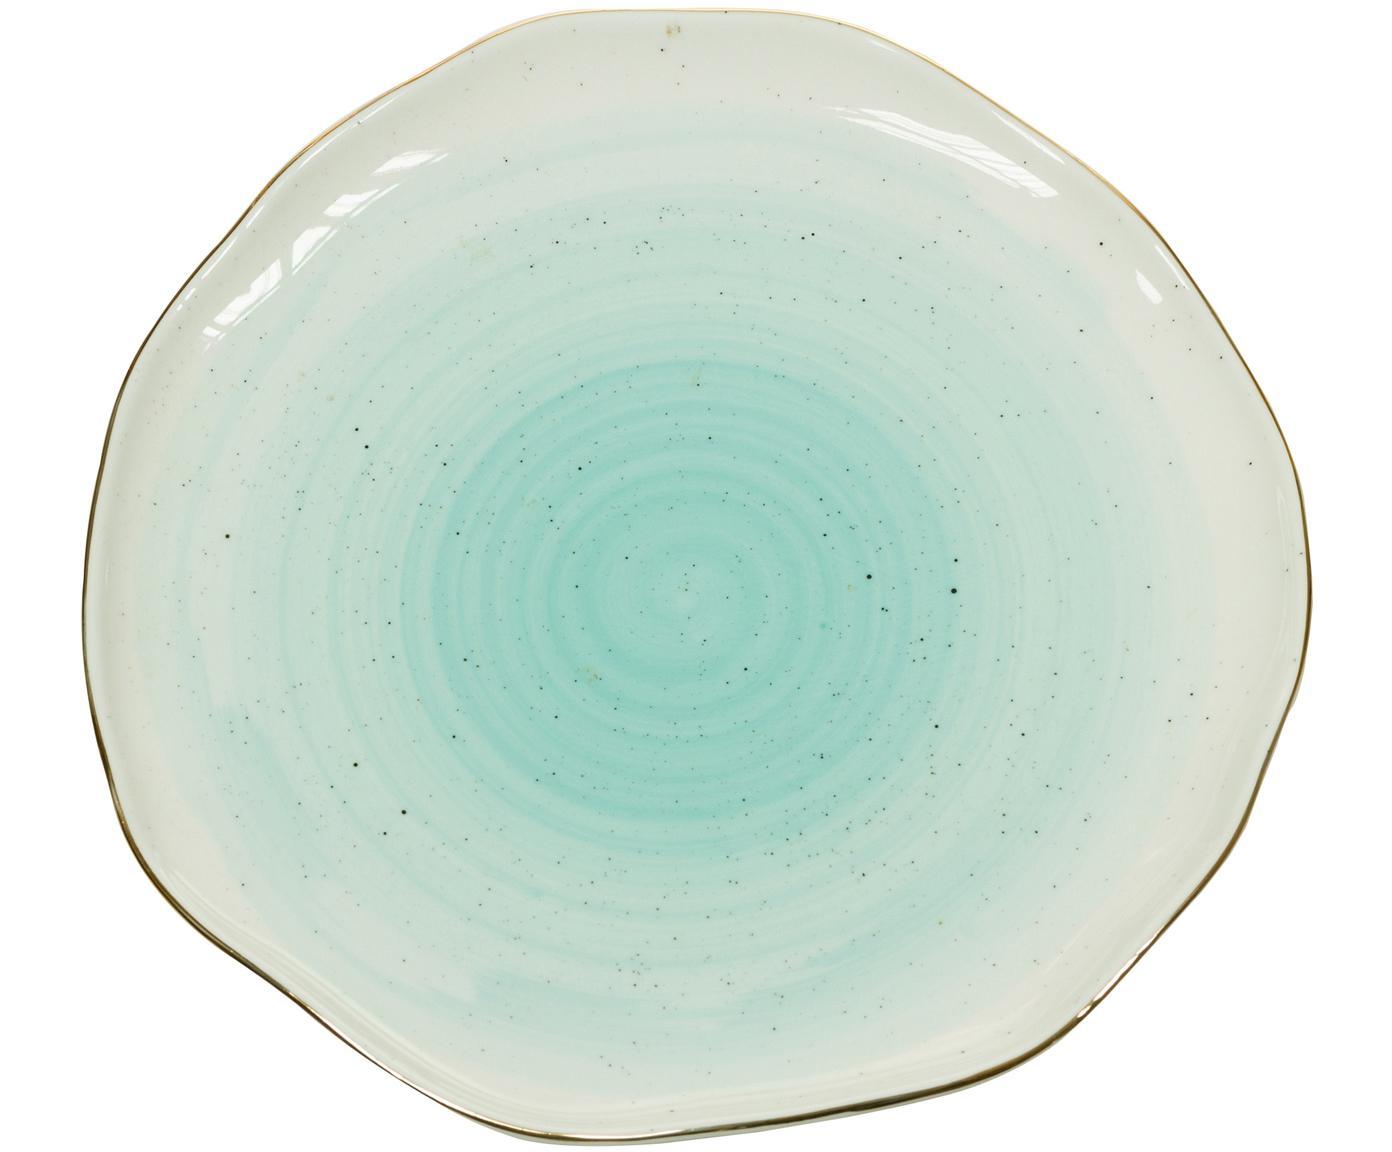 Handgefertigte Frühstücksteller Bol mit Goldrand, 2 Stück, Porzellan, Türkisblau, Ø 19 x H 3 cm